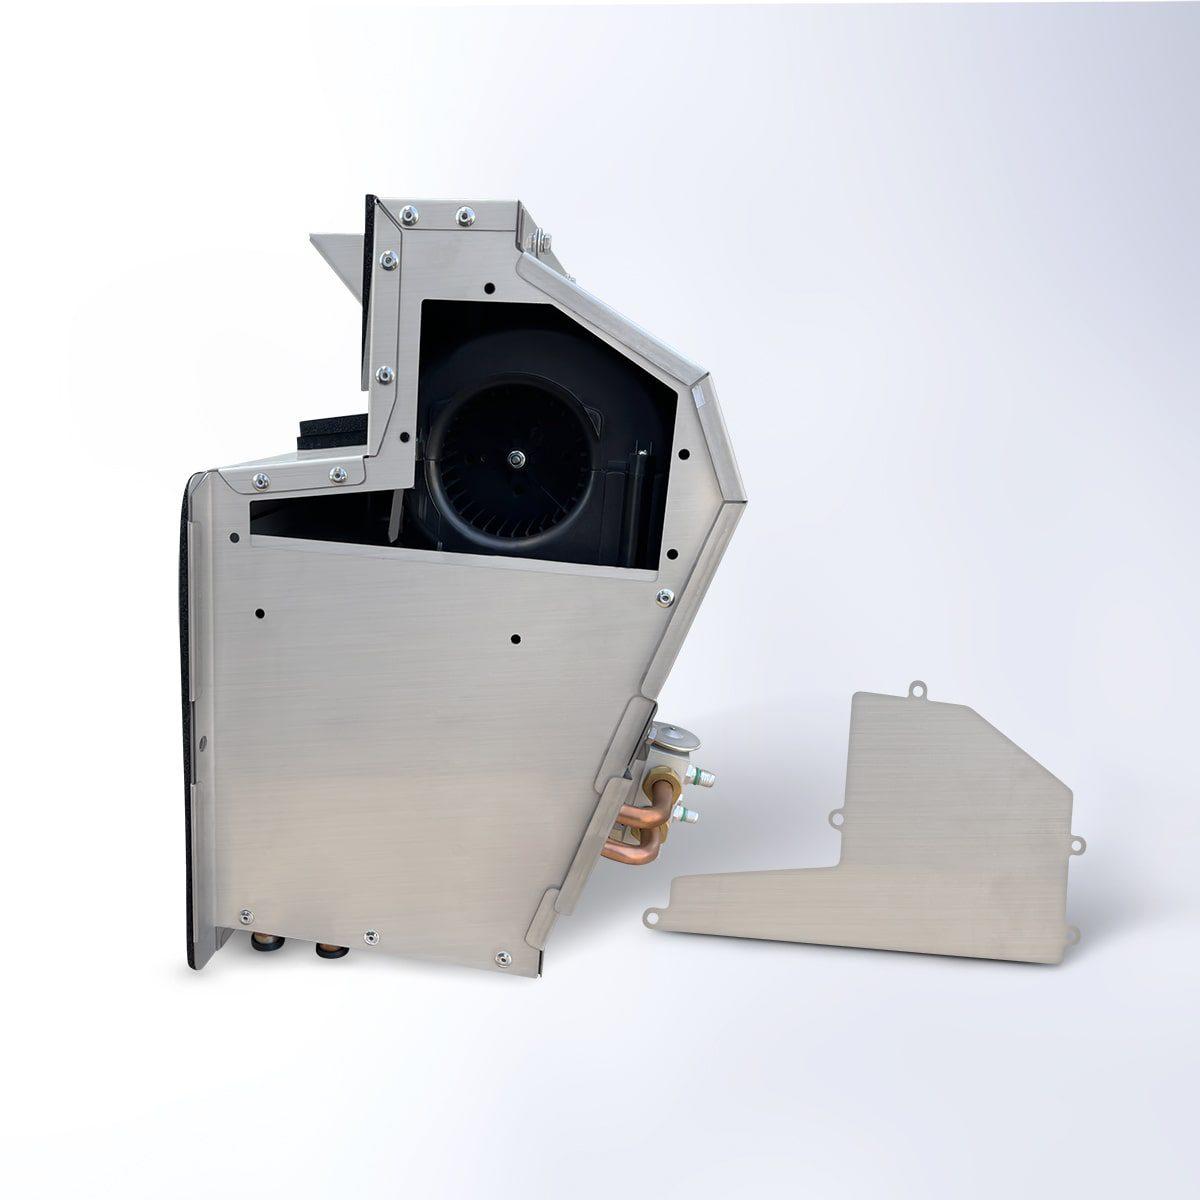 kenworth stainless steel hvac box heater ac box assembly 4 copy min